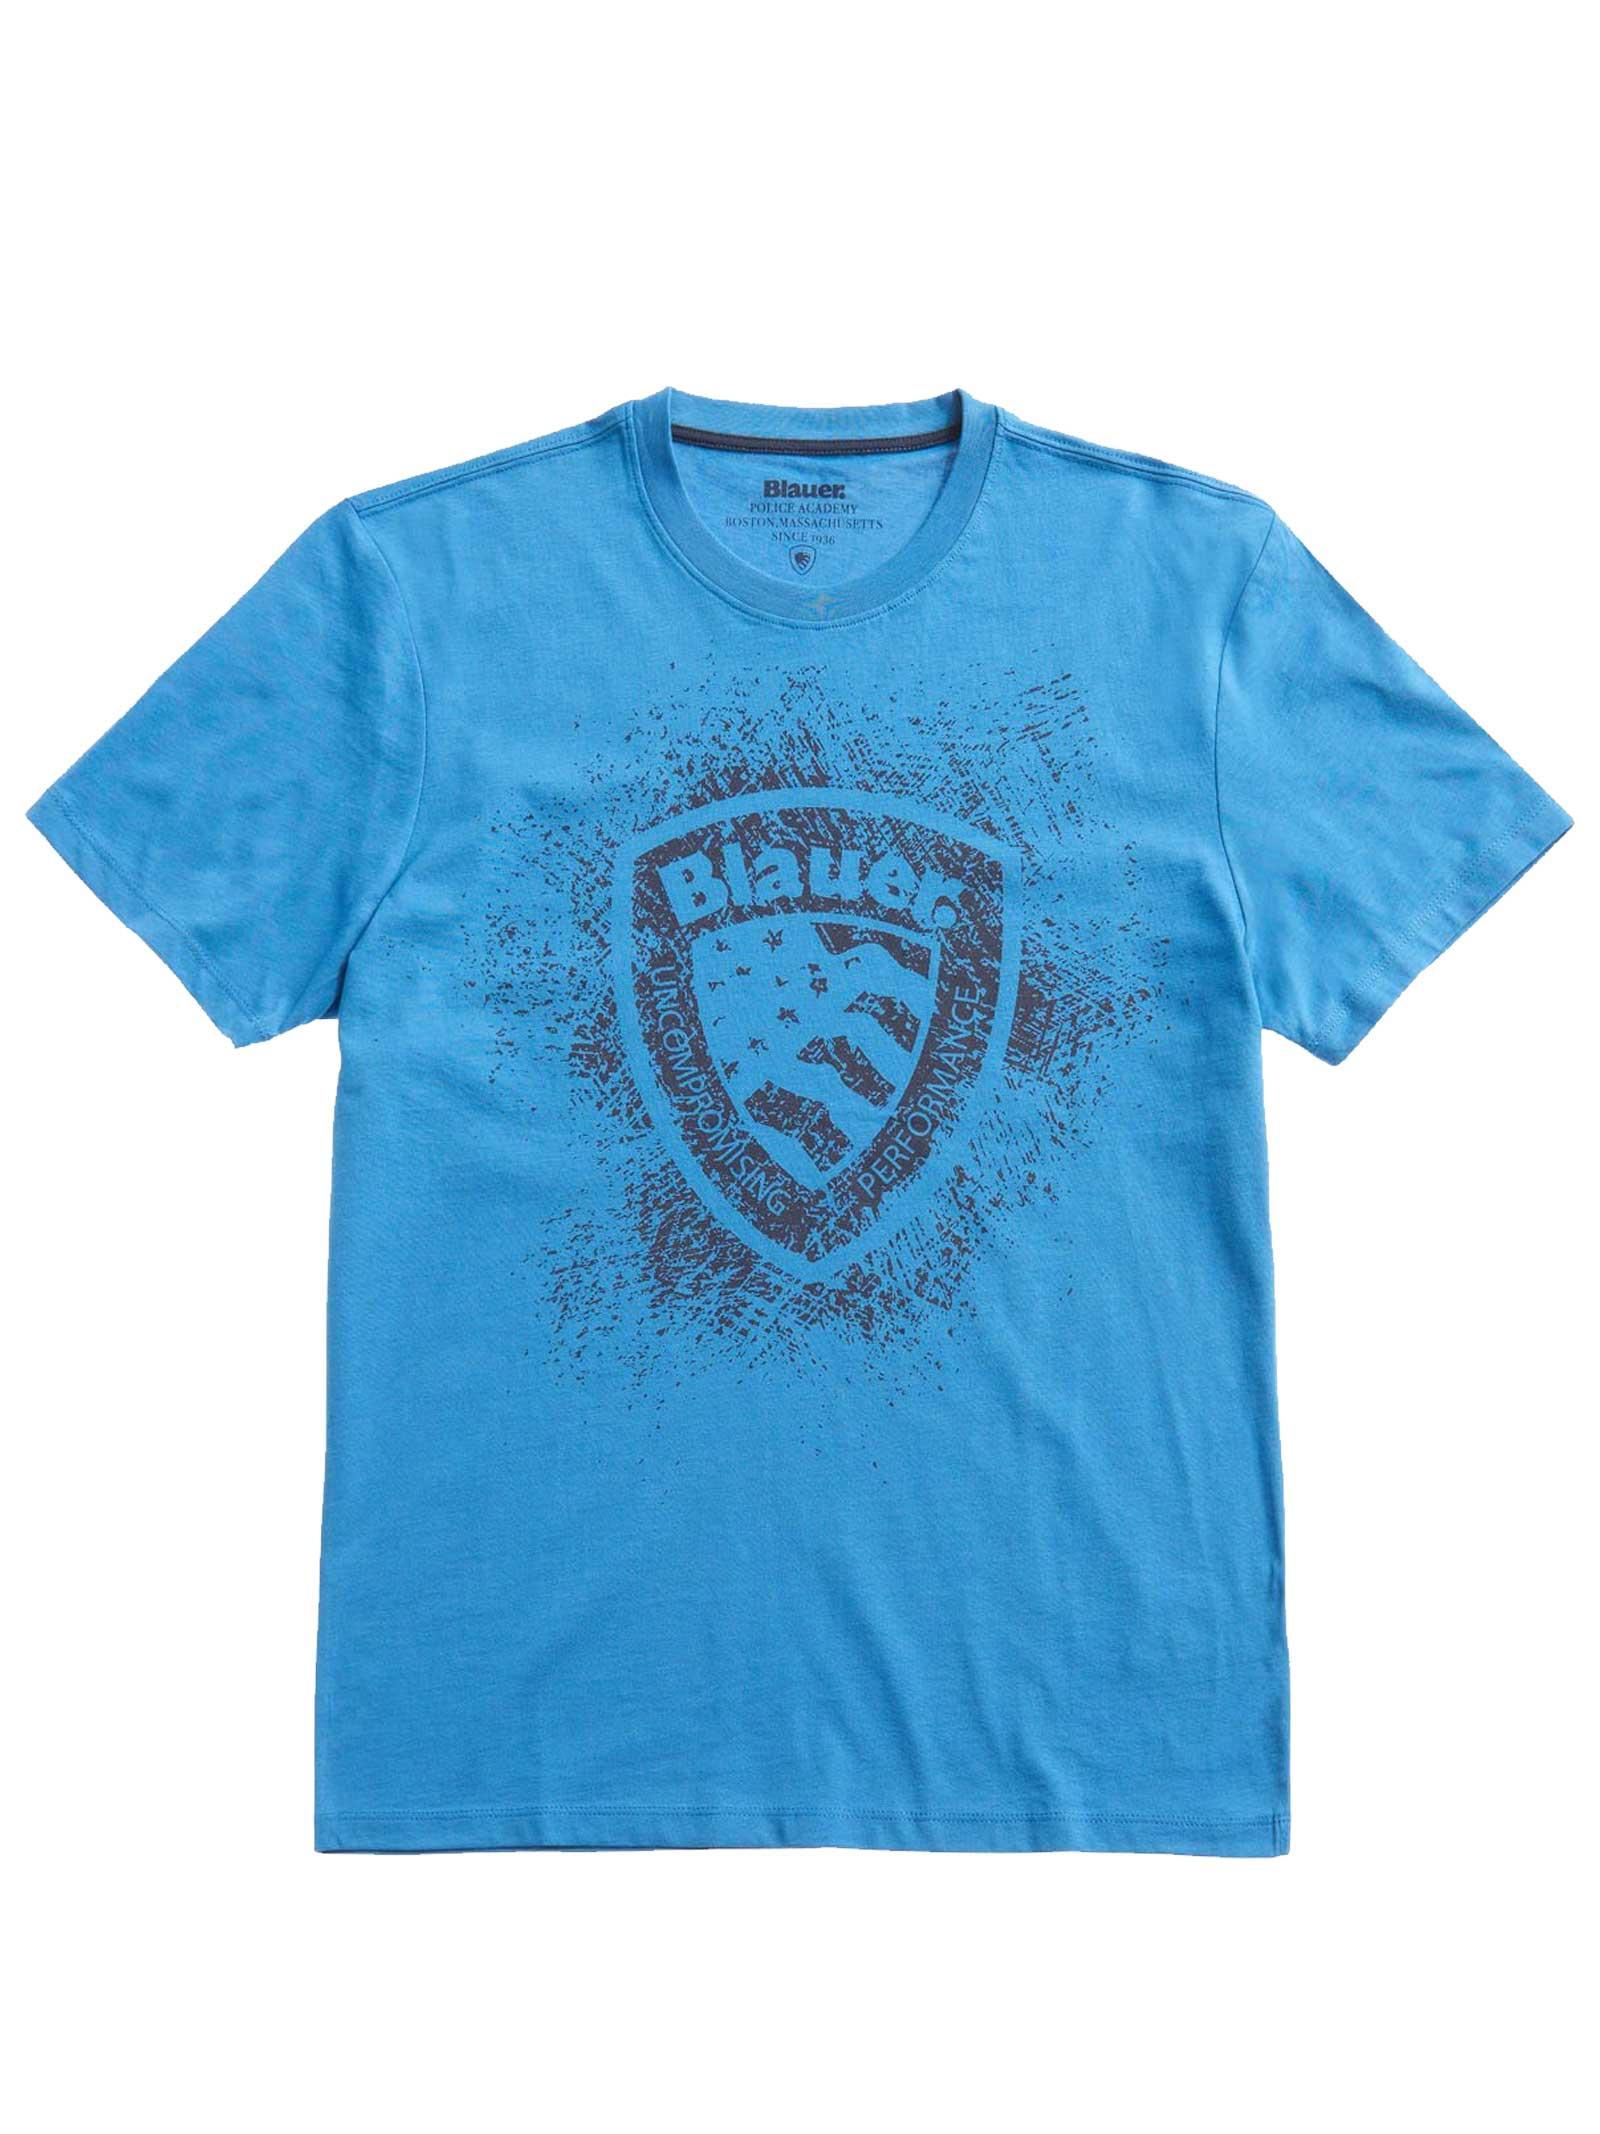 T-SHIRT BLAUER BLAUER   T-shirt   21SBLUH02134-004547801